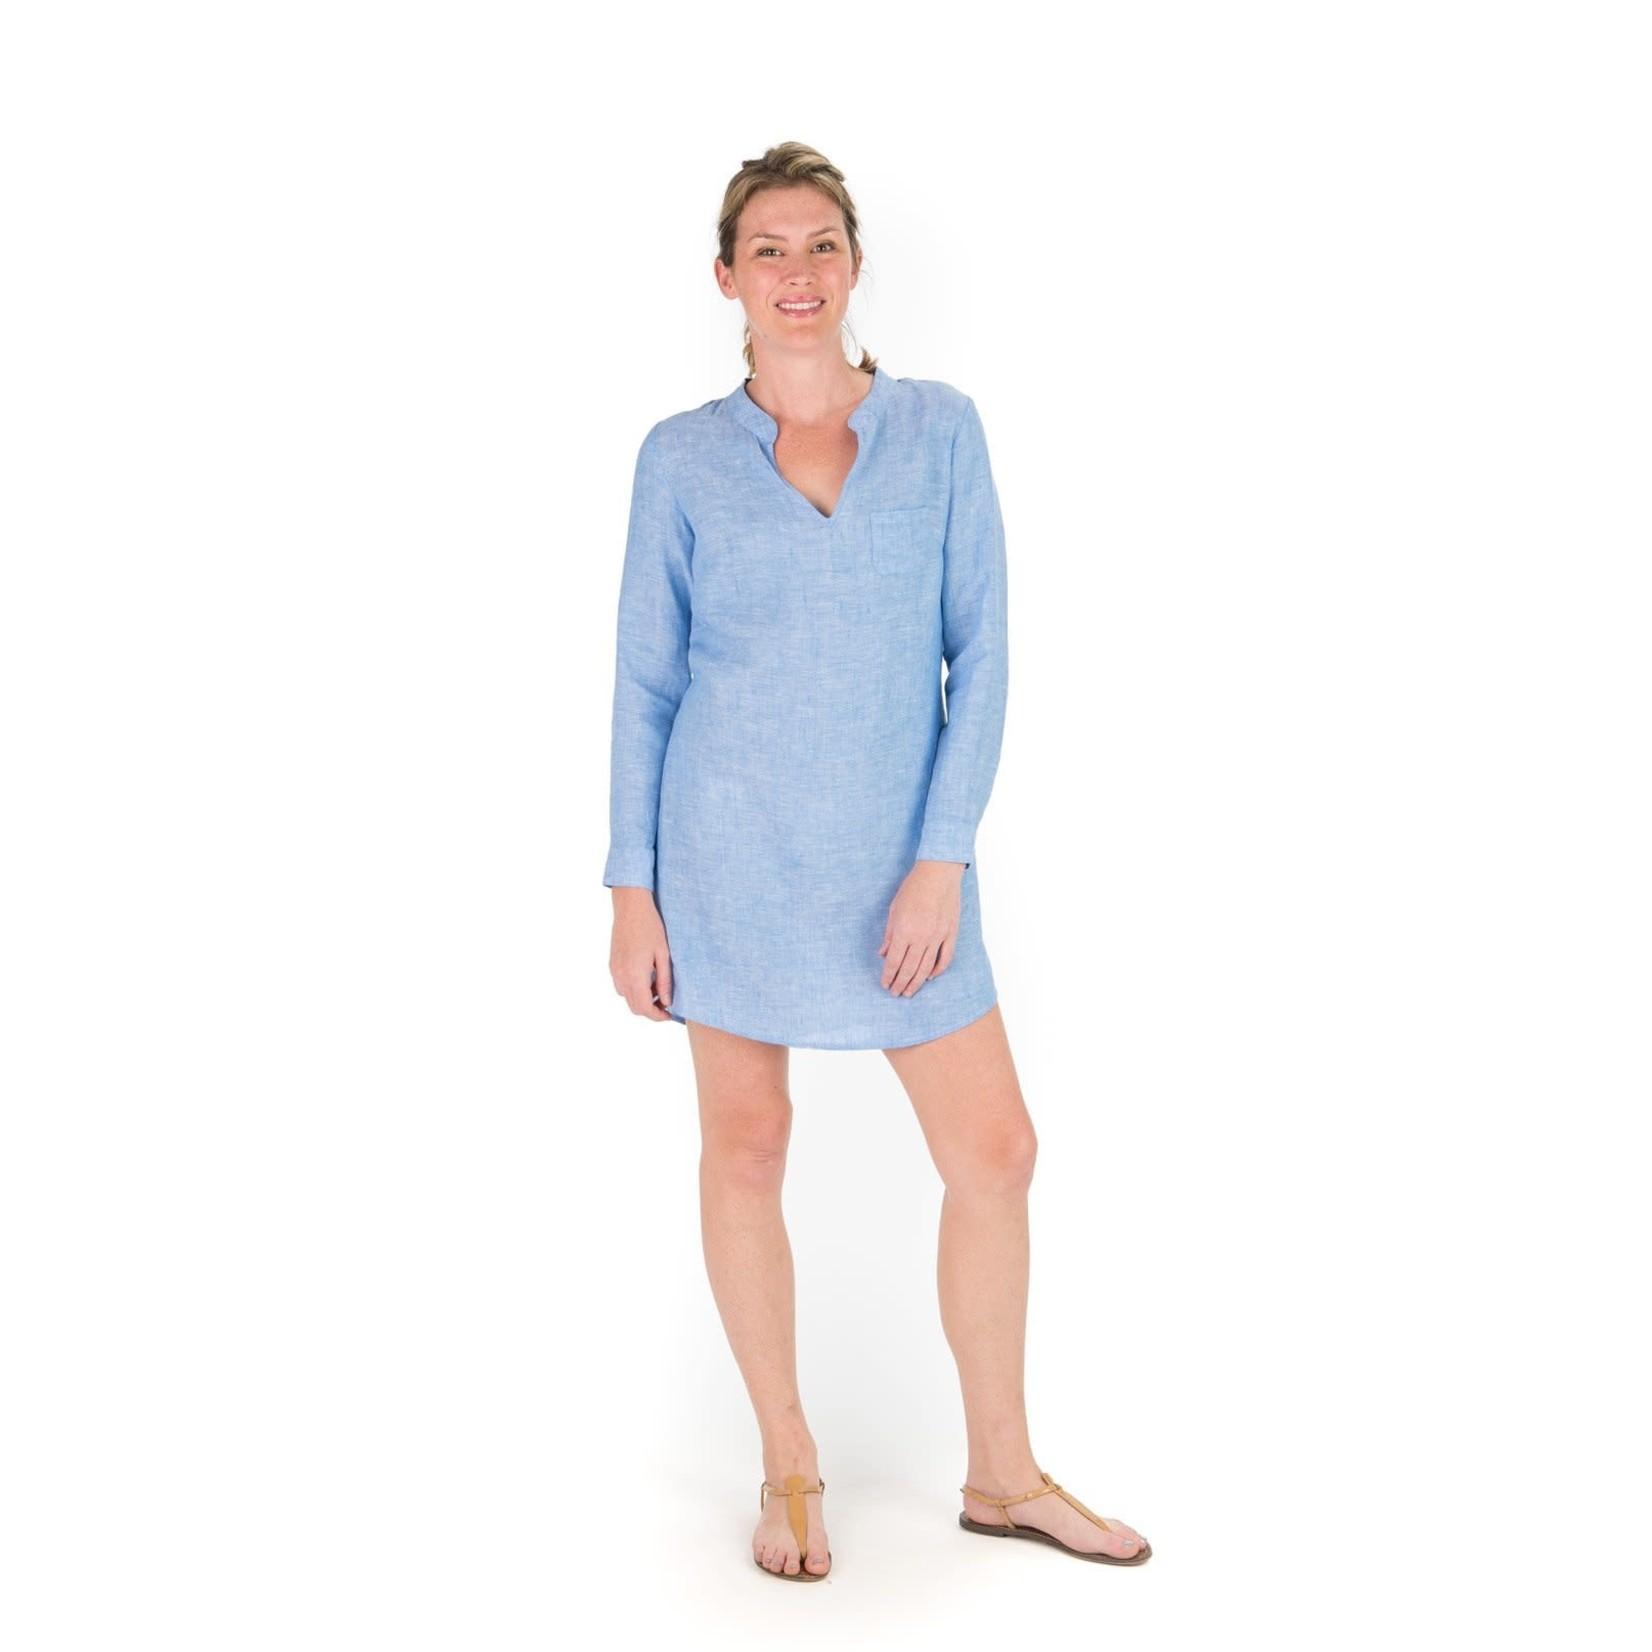 Bananakeet Dress